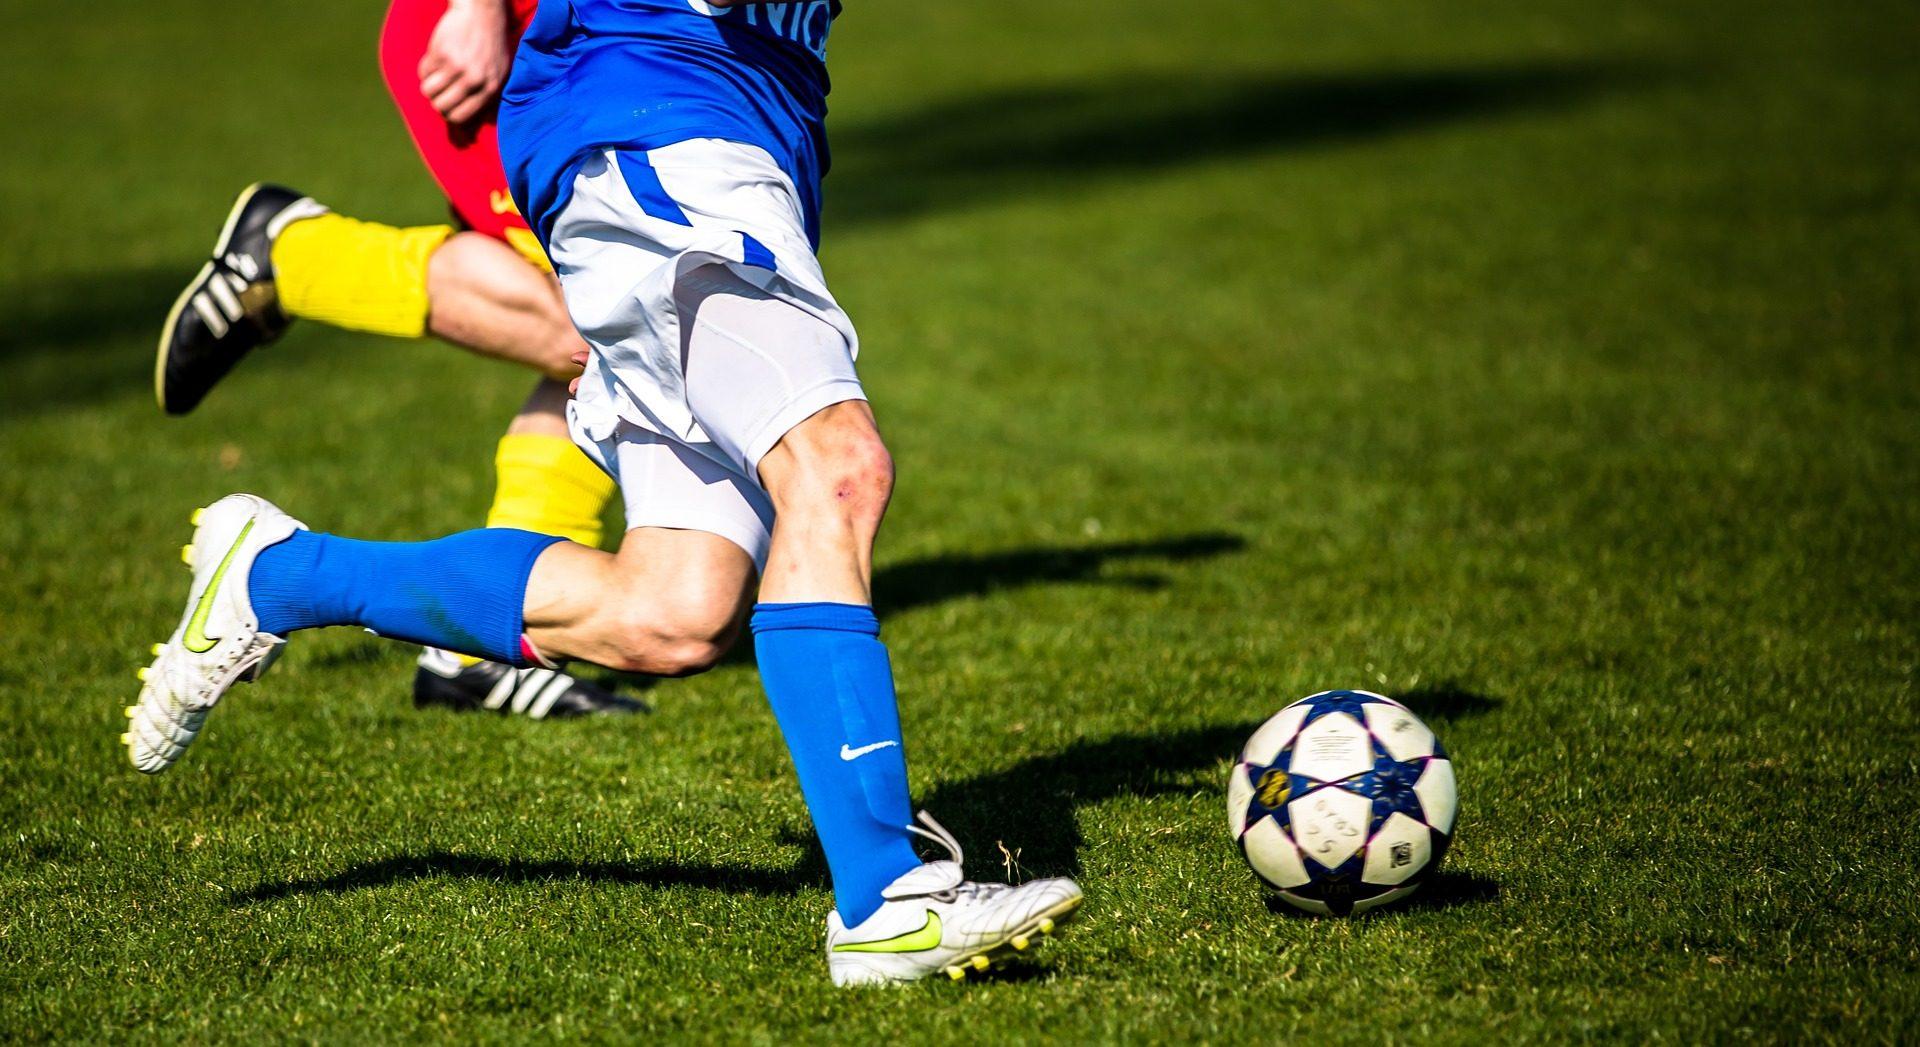 फुटबॉल, खिलाड़ियों, बैलून, फ़ील्ड, लॉन - HD वॉलपेपर - प्रोफेसर-falken.com